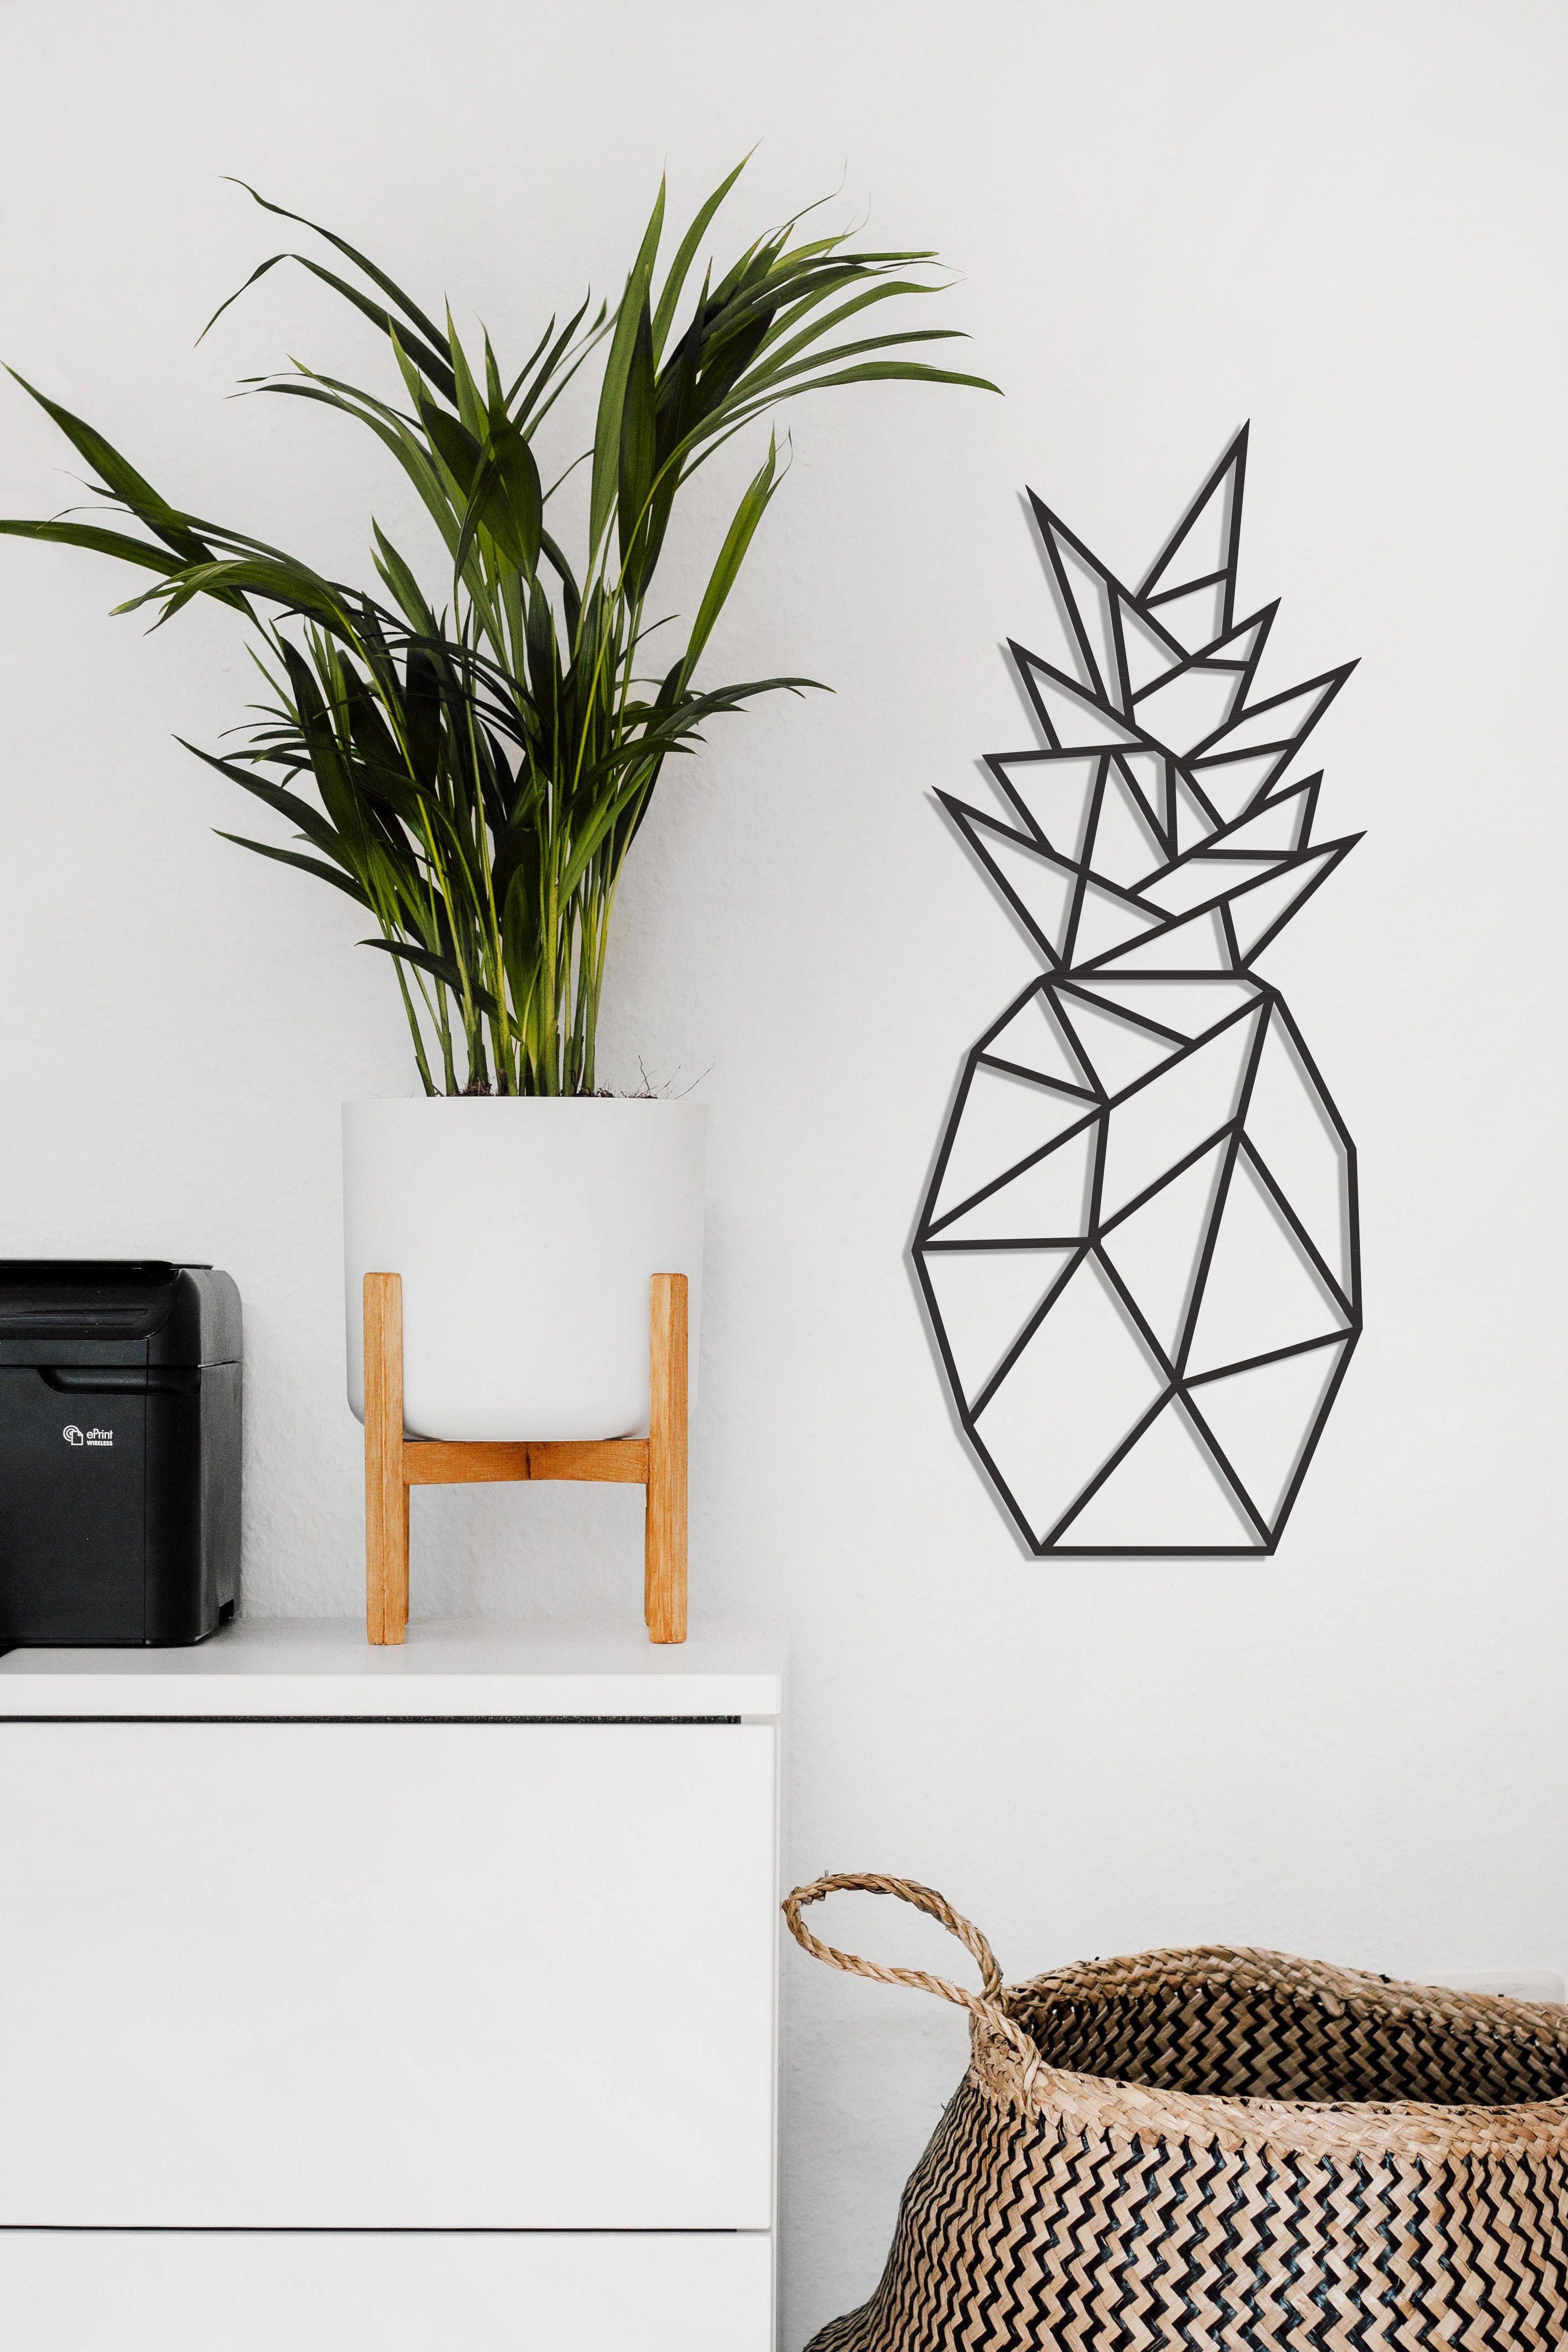 Pineapple Metal Wall Decor Is Designed By Serenity Studio Pineapple Wall Art Metal Decor Stylish Deco House Warming Gift Diy Kitchen Metal Wall Room Decor